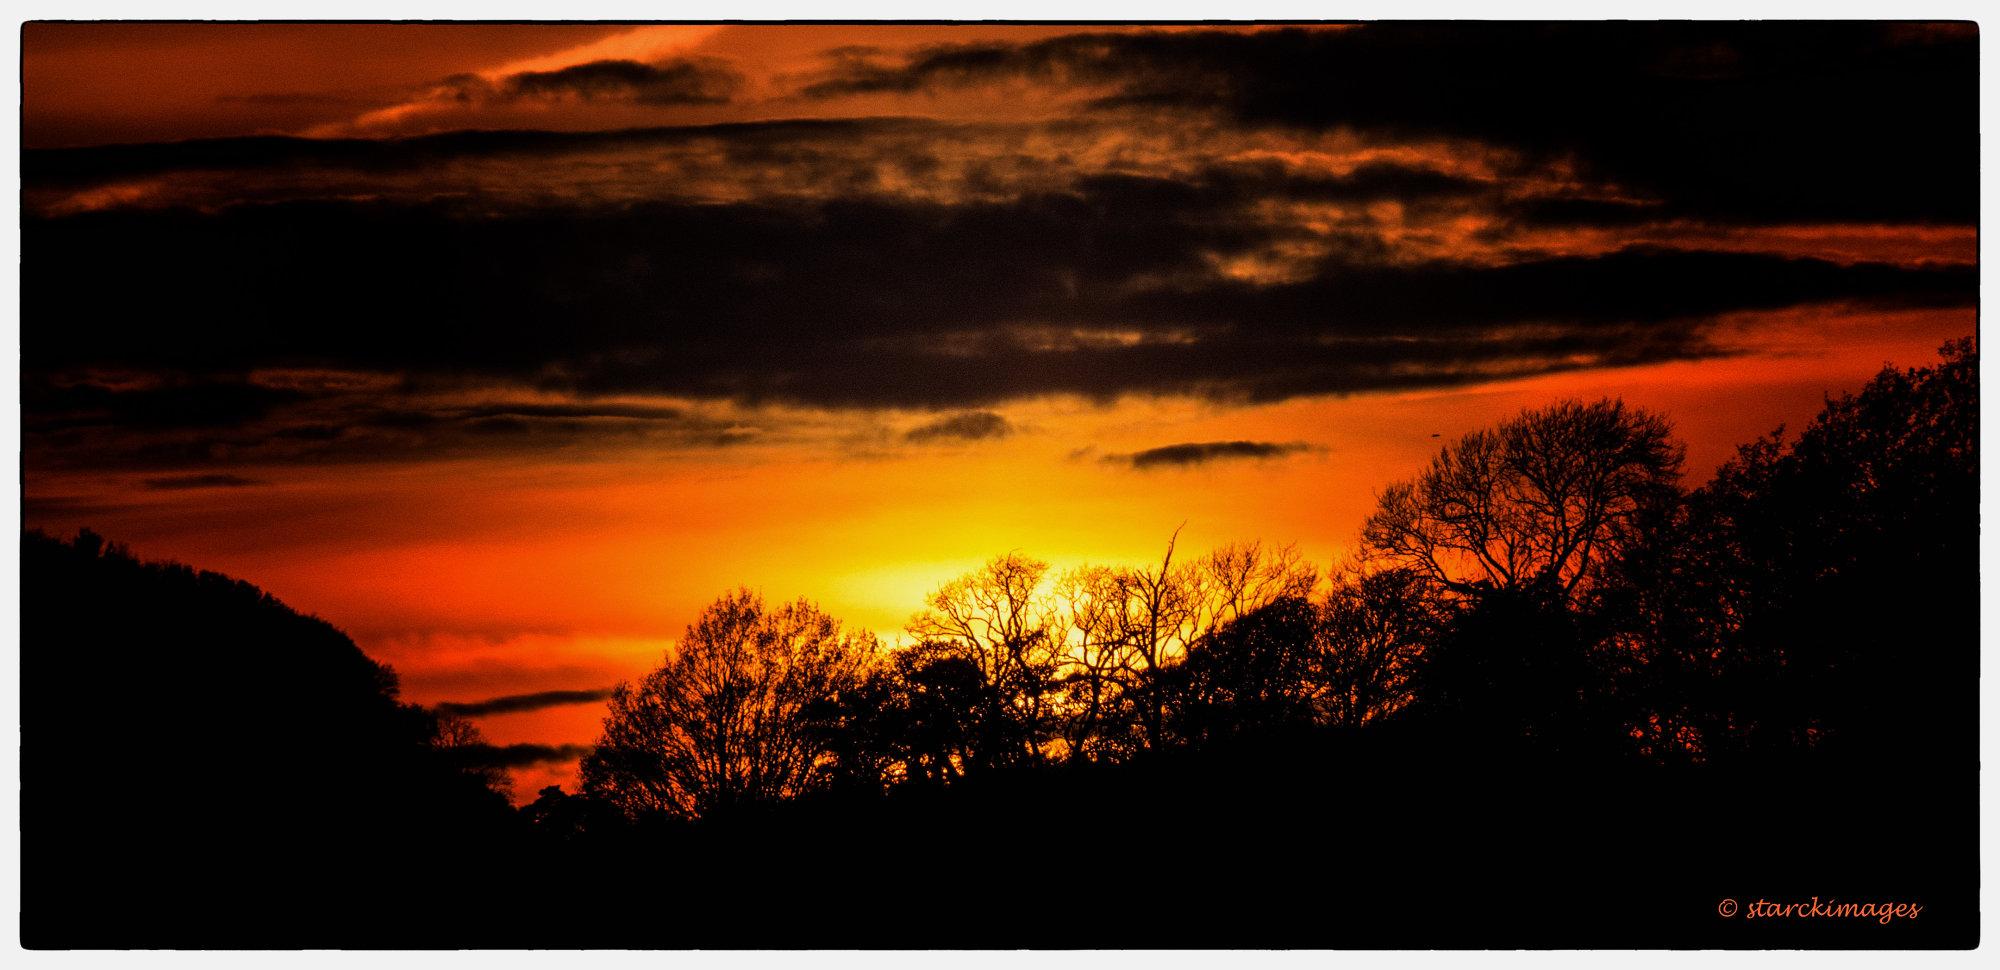 Last Night's Sunset Near Colmer's Hill, Dorset